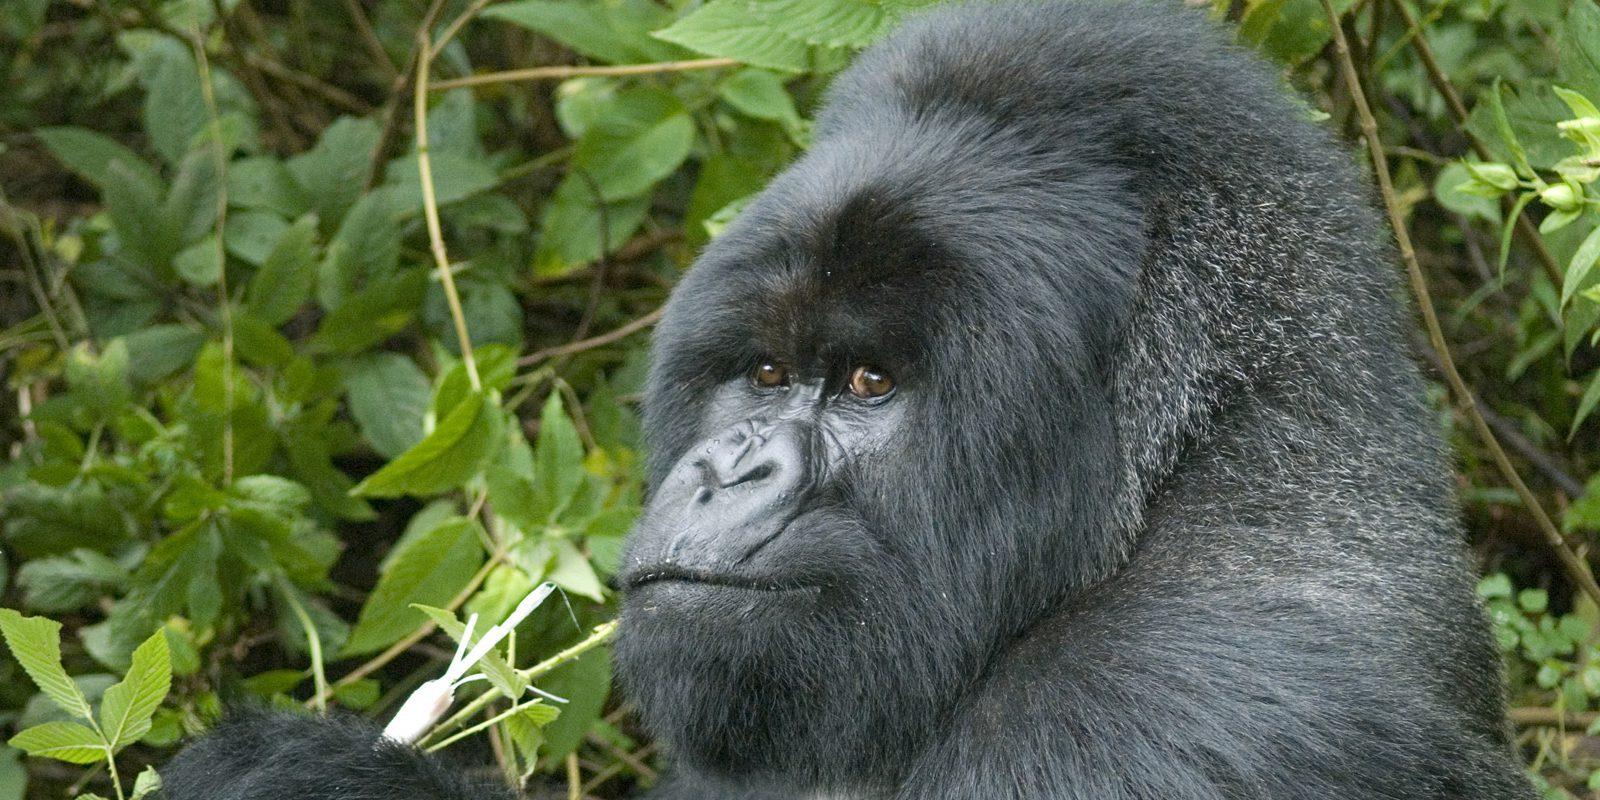 close up silverback gorilla image seen on rwanda safari